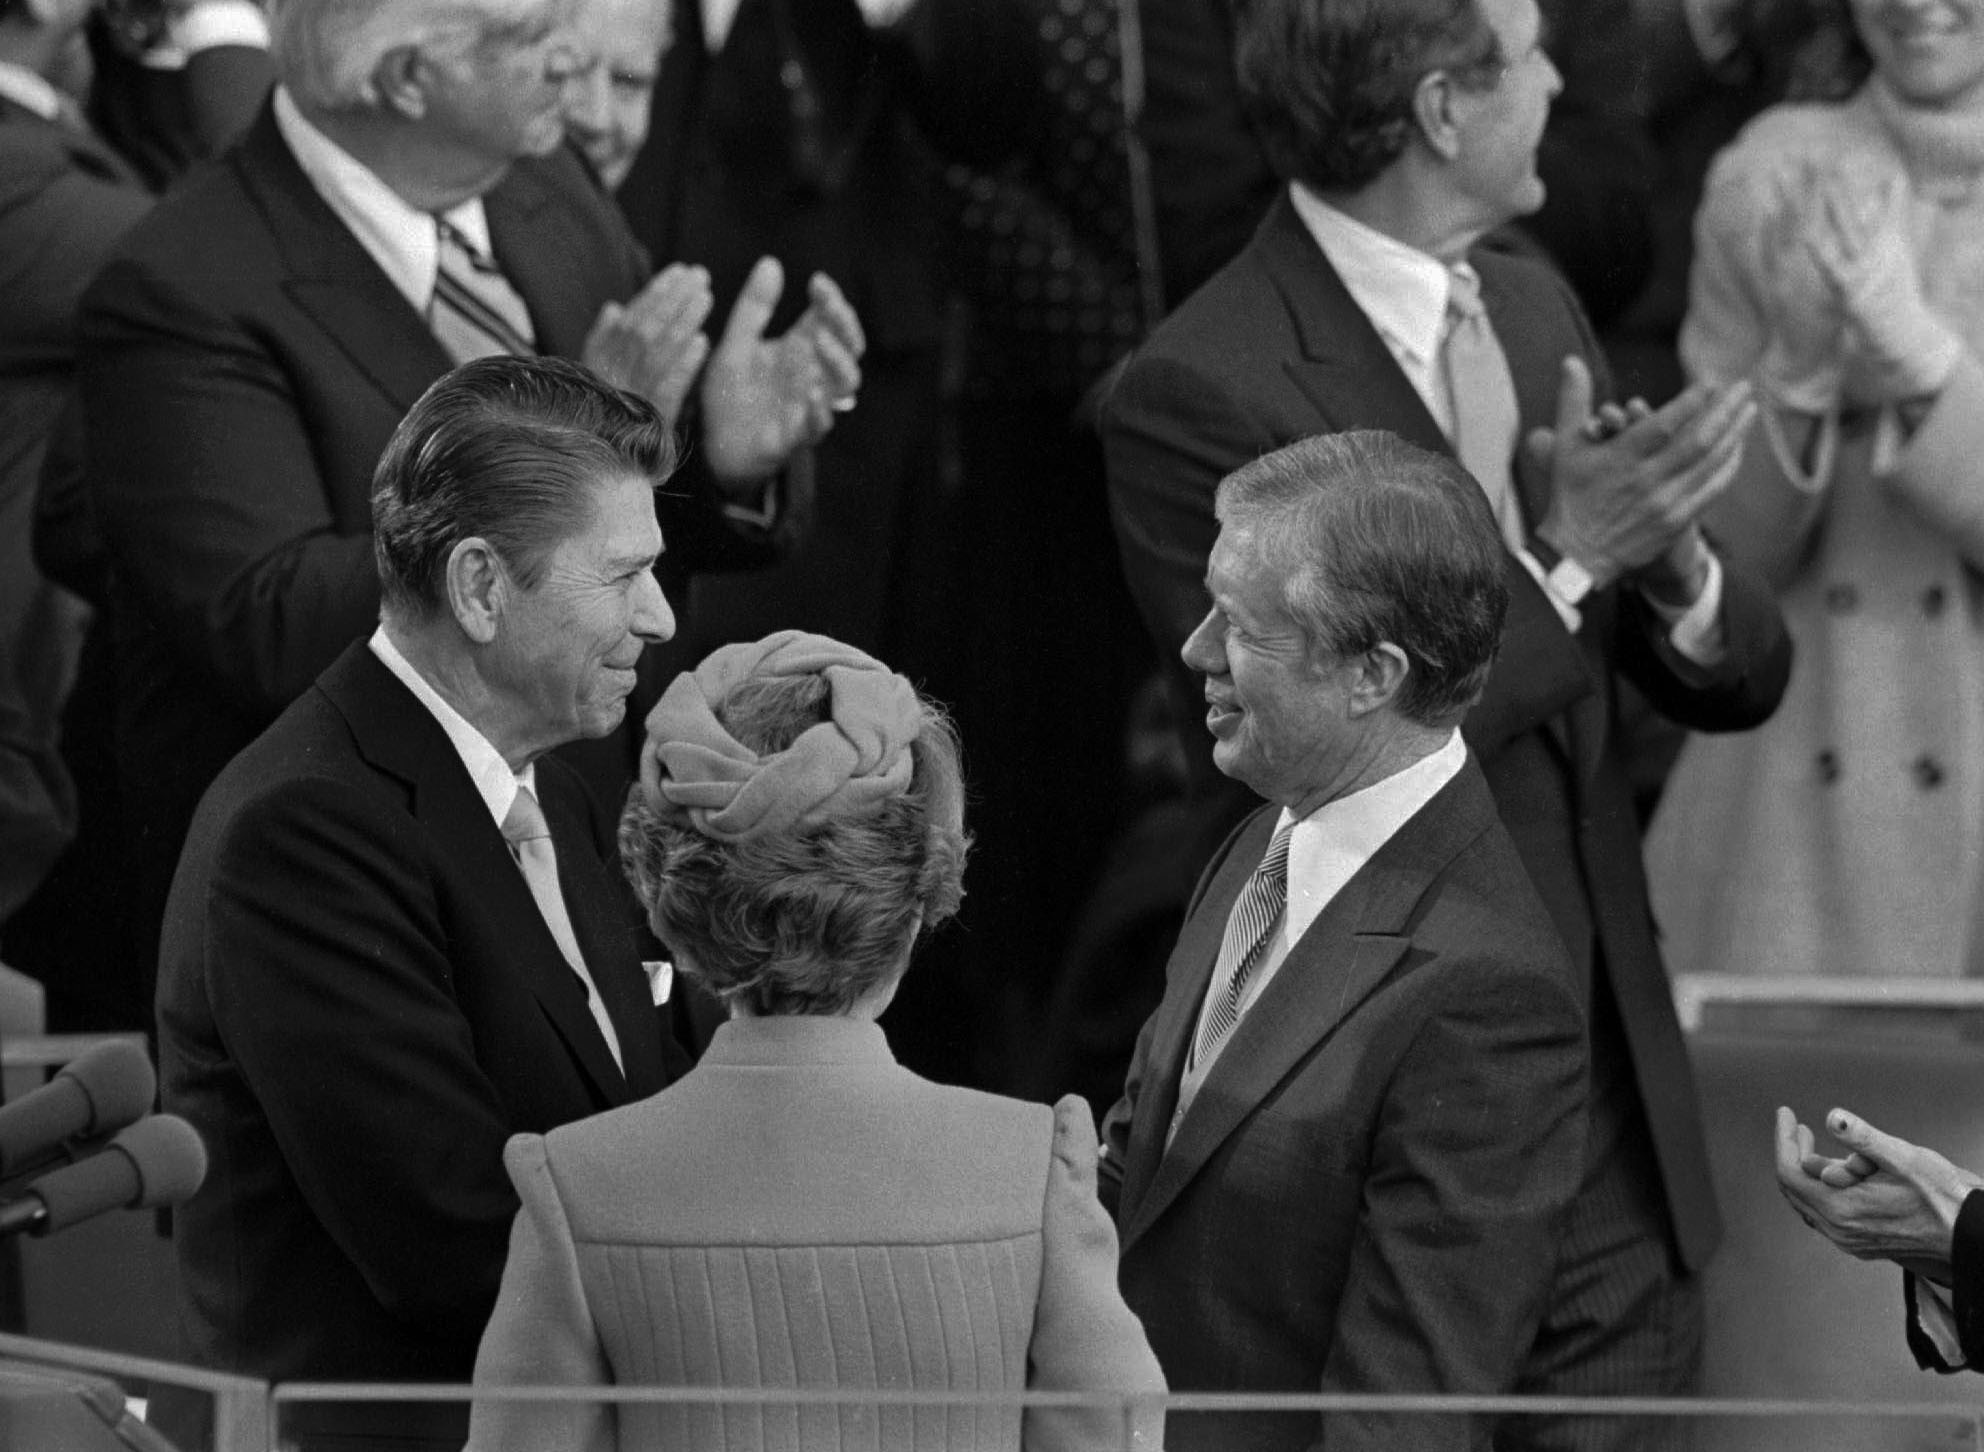 1980 Reagan vs. Carter